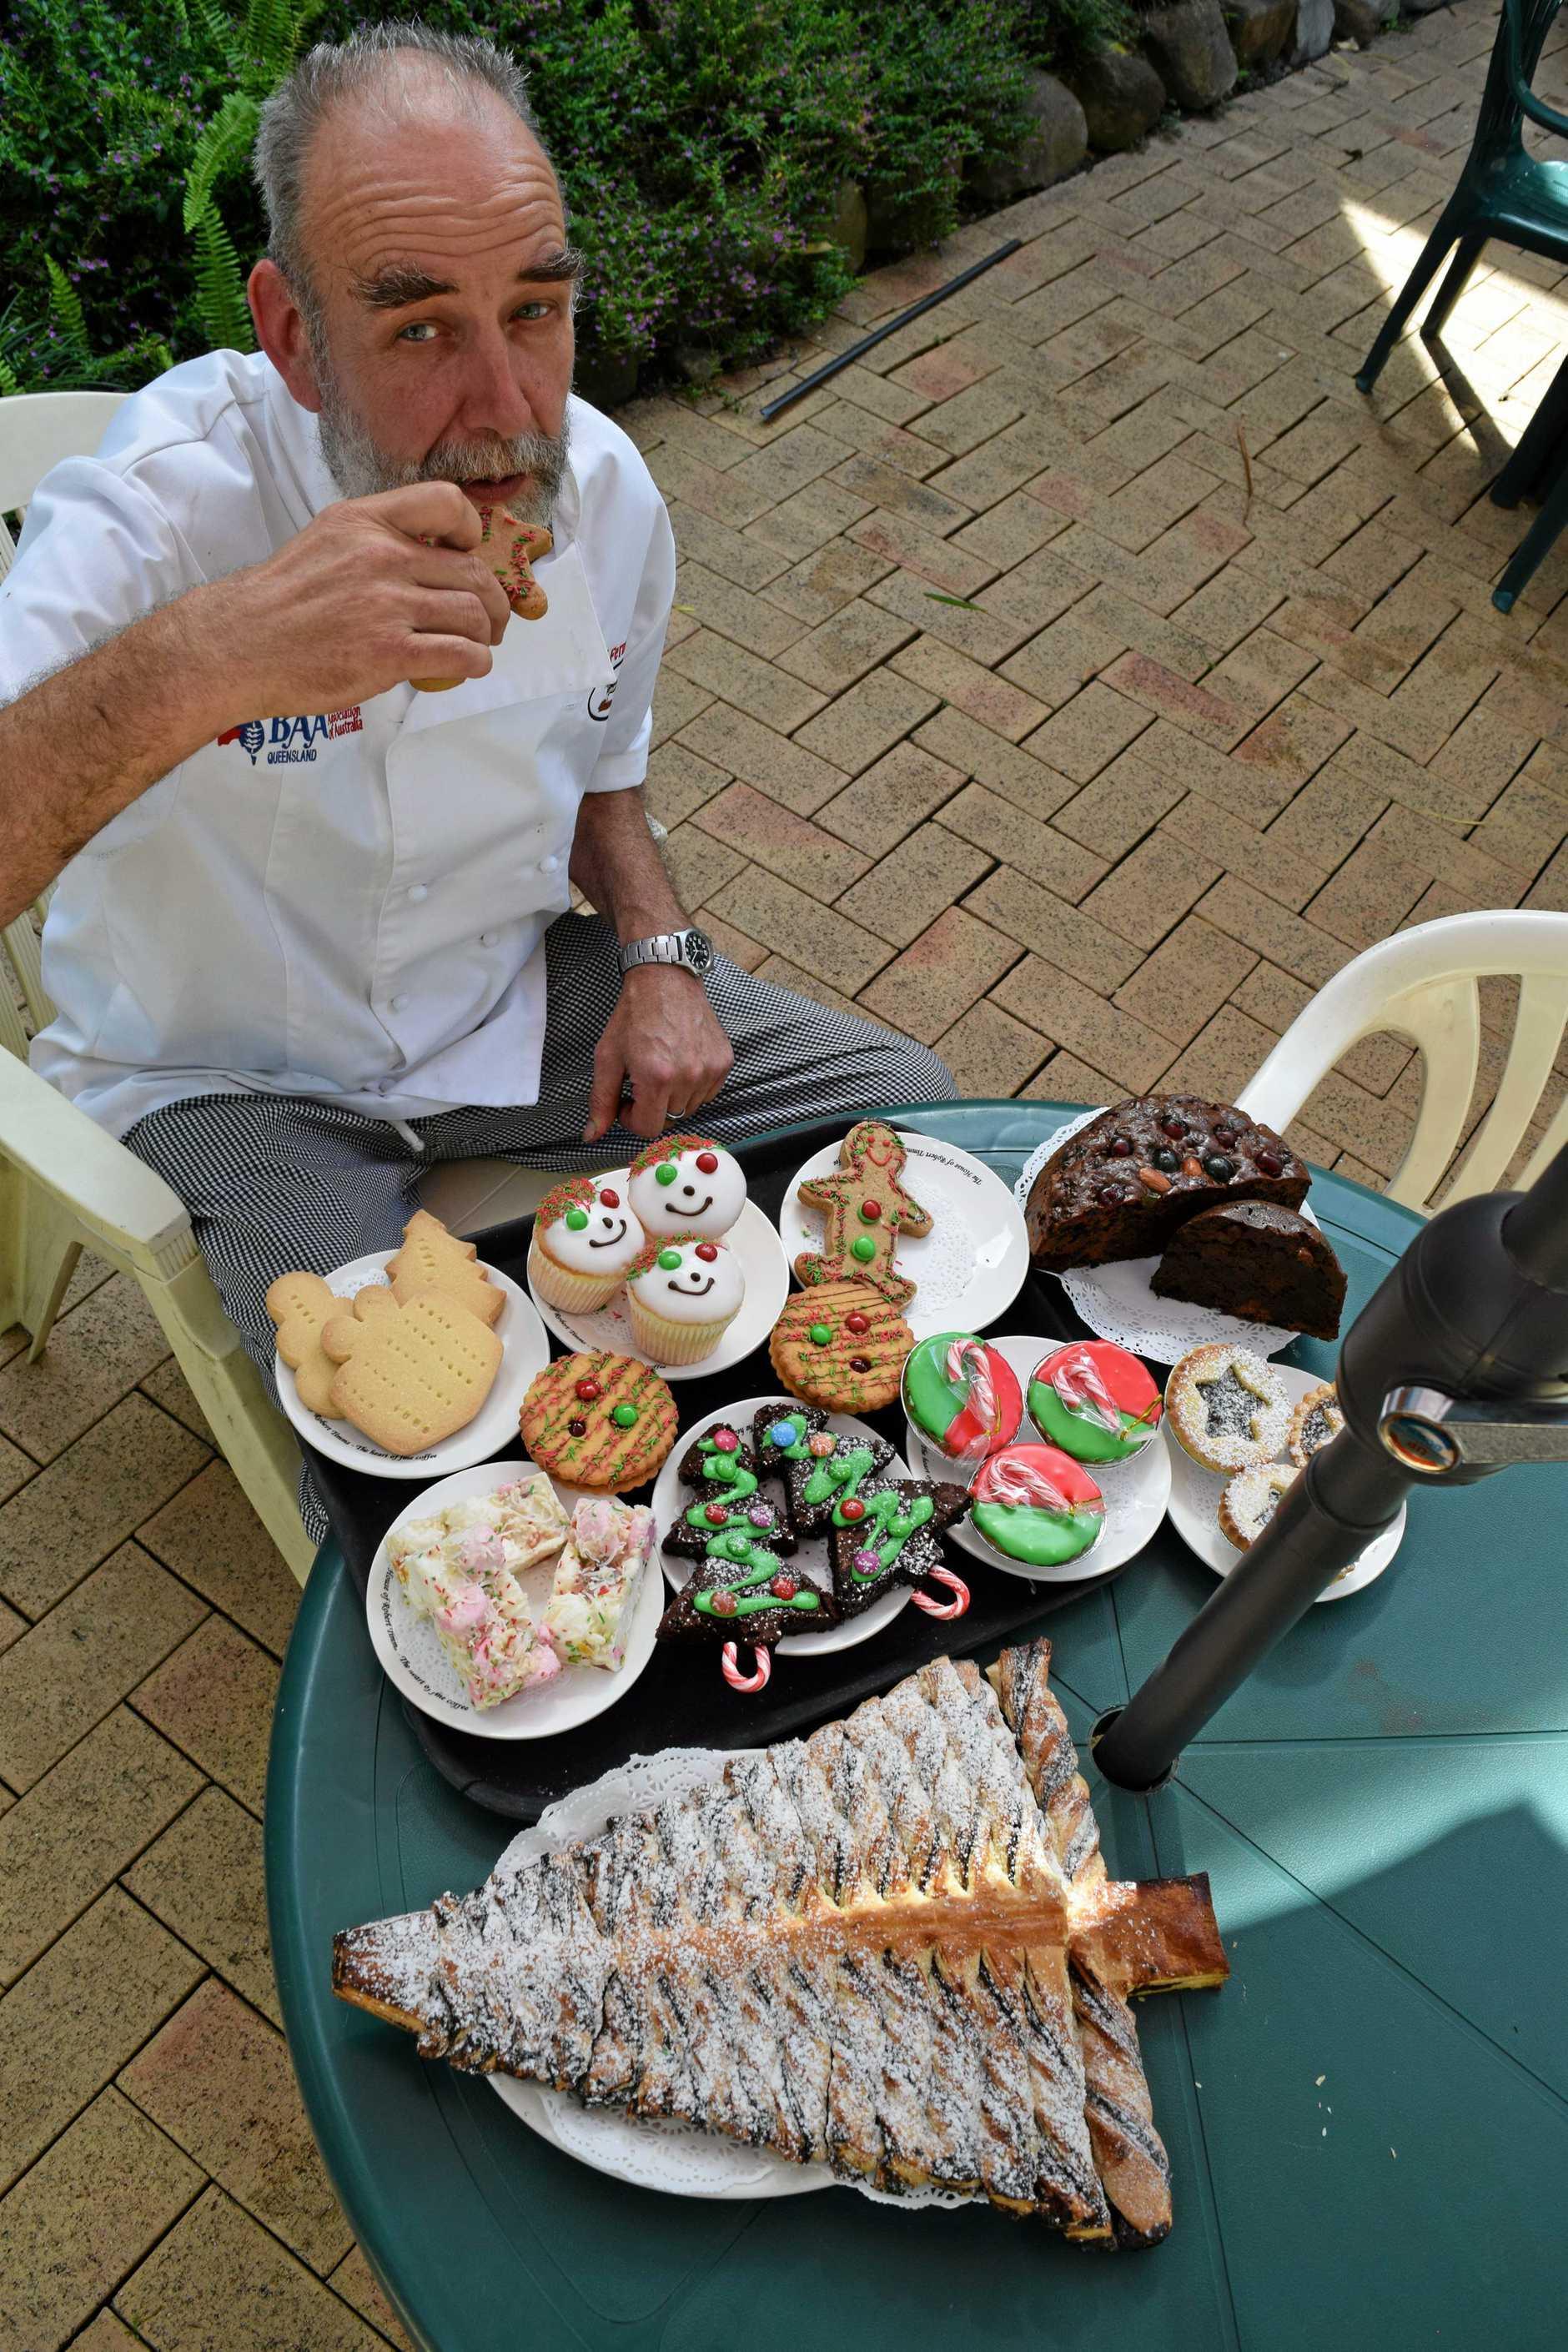 Old Fernvale Bakery baker Matt Brown is an expert at whipping up Christmas treats.